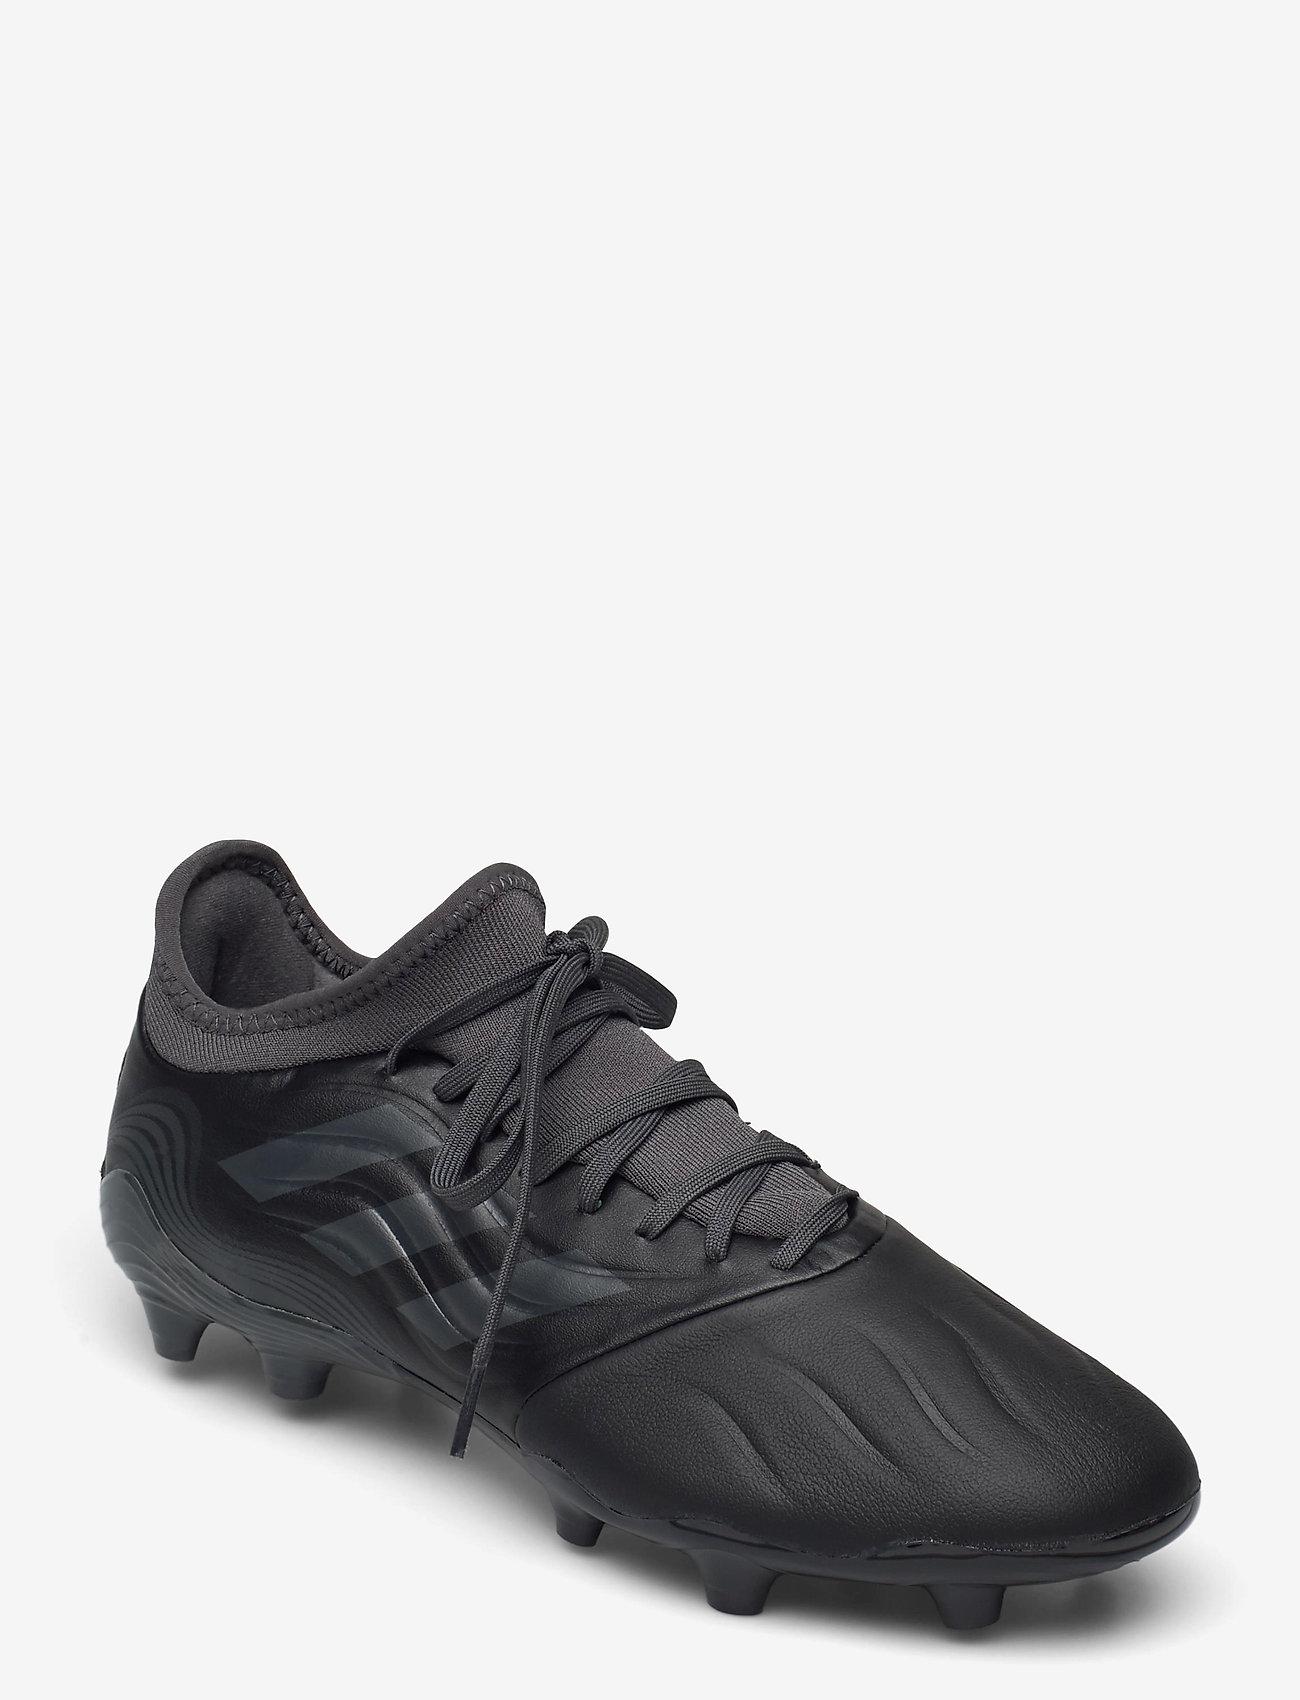 adidas Performance - Copa Sense.3 Firm Ground Boots - fotballsko - cblack/gresix/gresix - 0